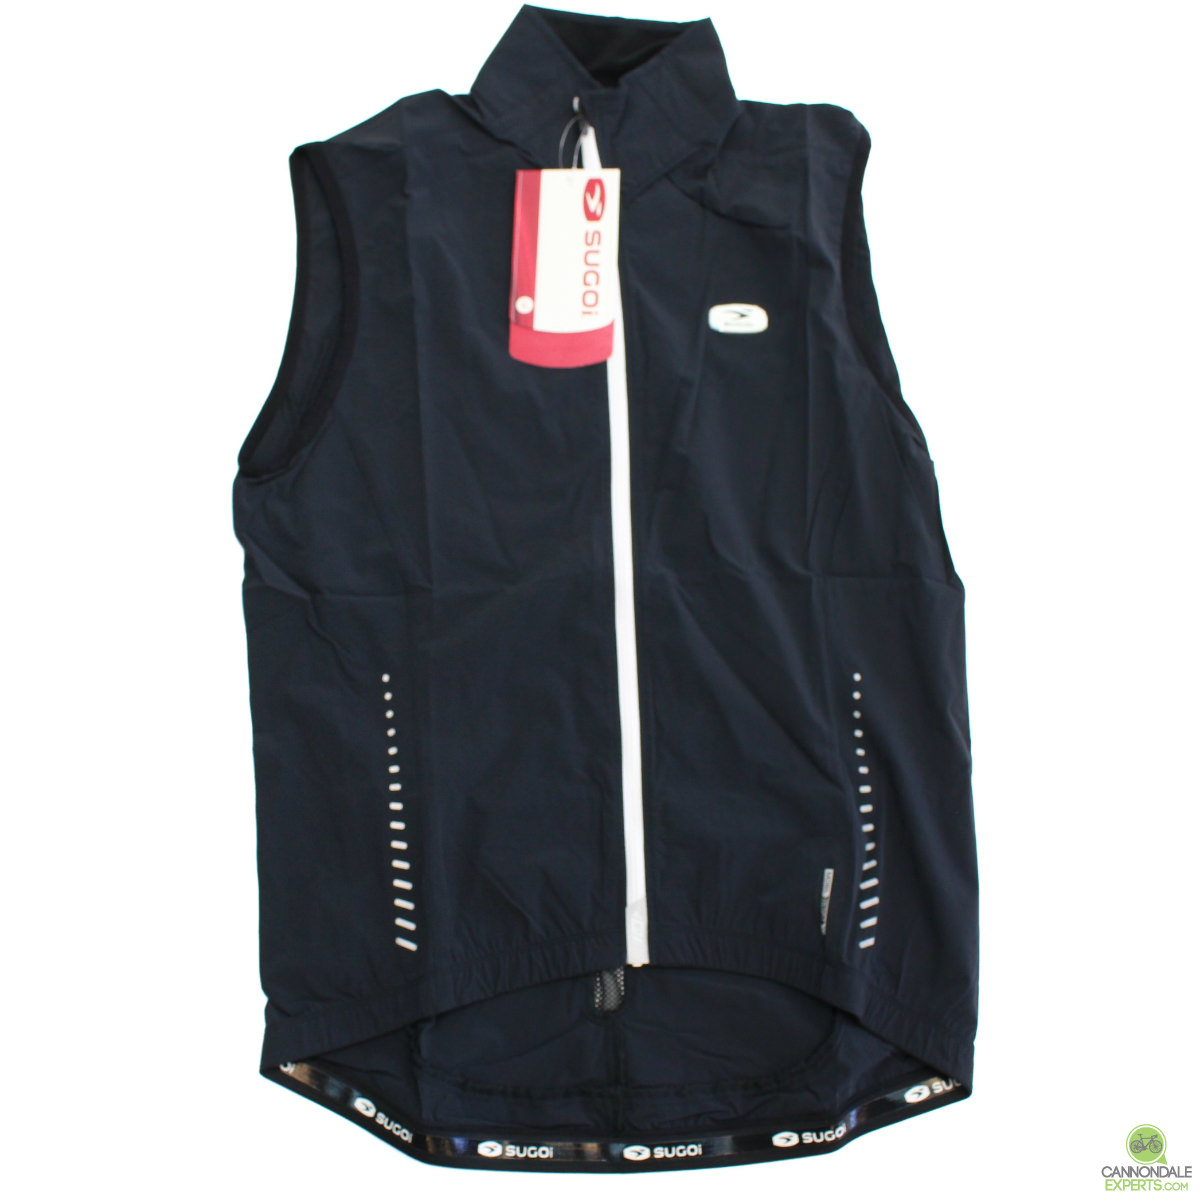 0bfff8905 Sugoi RS Vest Black - Large 714642907763